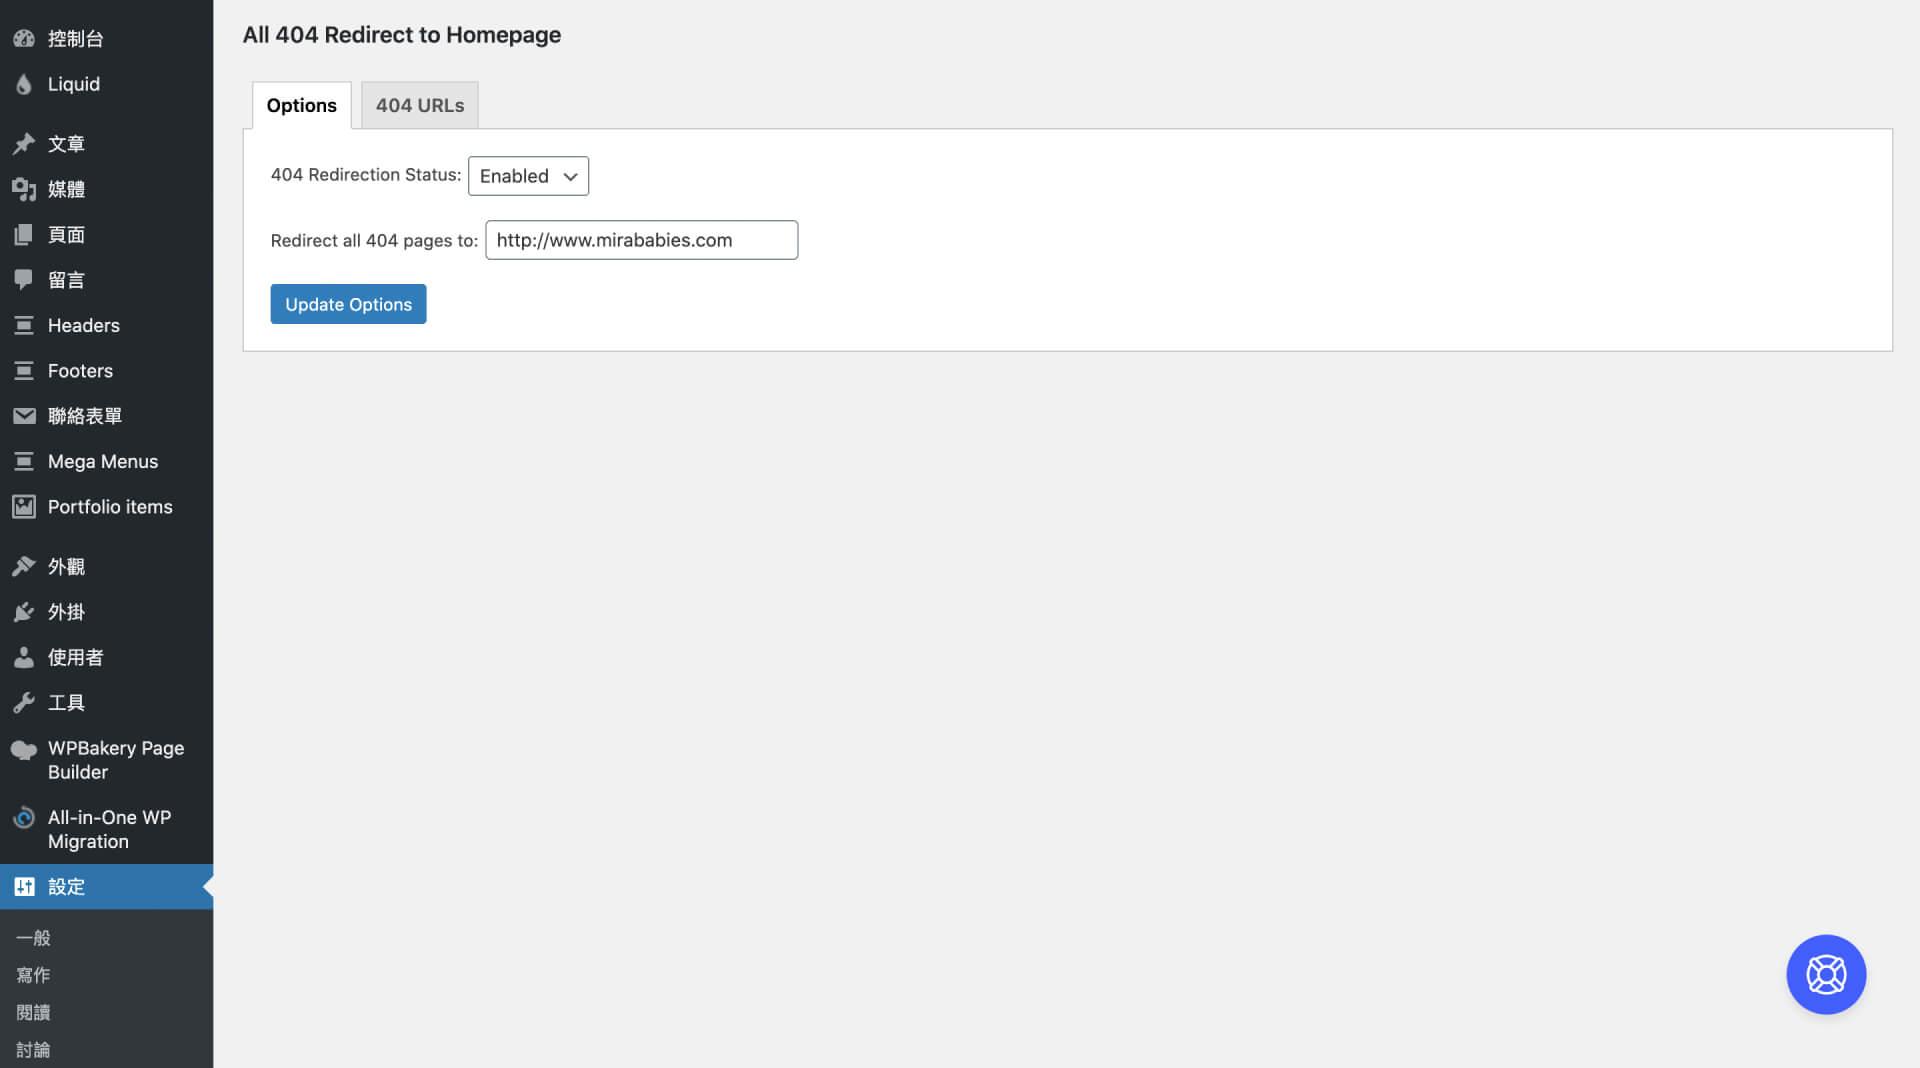 All 404 Redirect to Homepage 外掛設定介面 — 編輯區:Options-IrvingLab 爾文實驗室